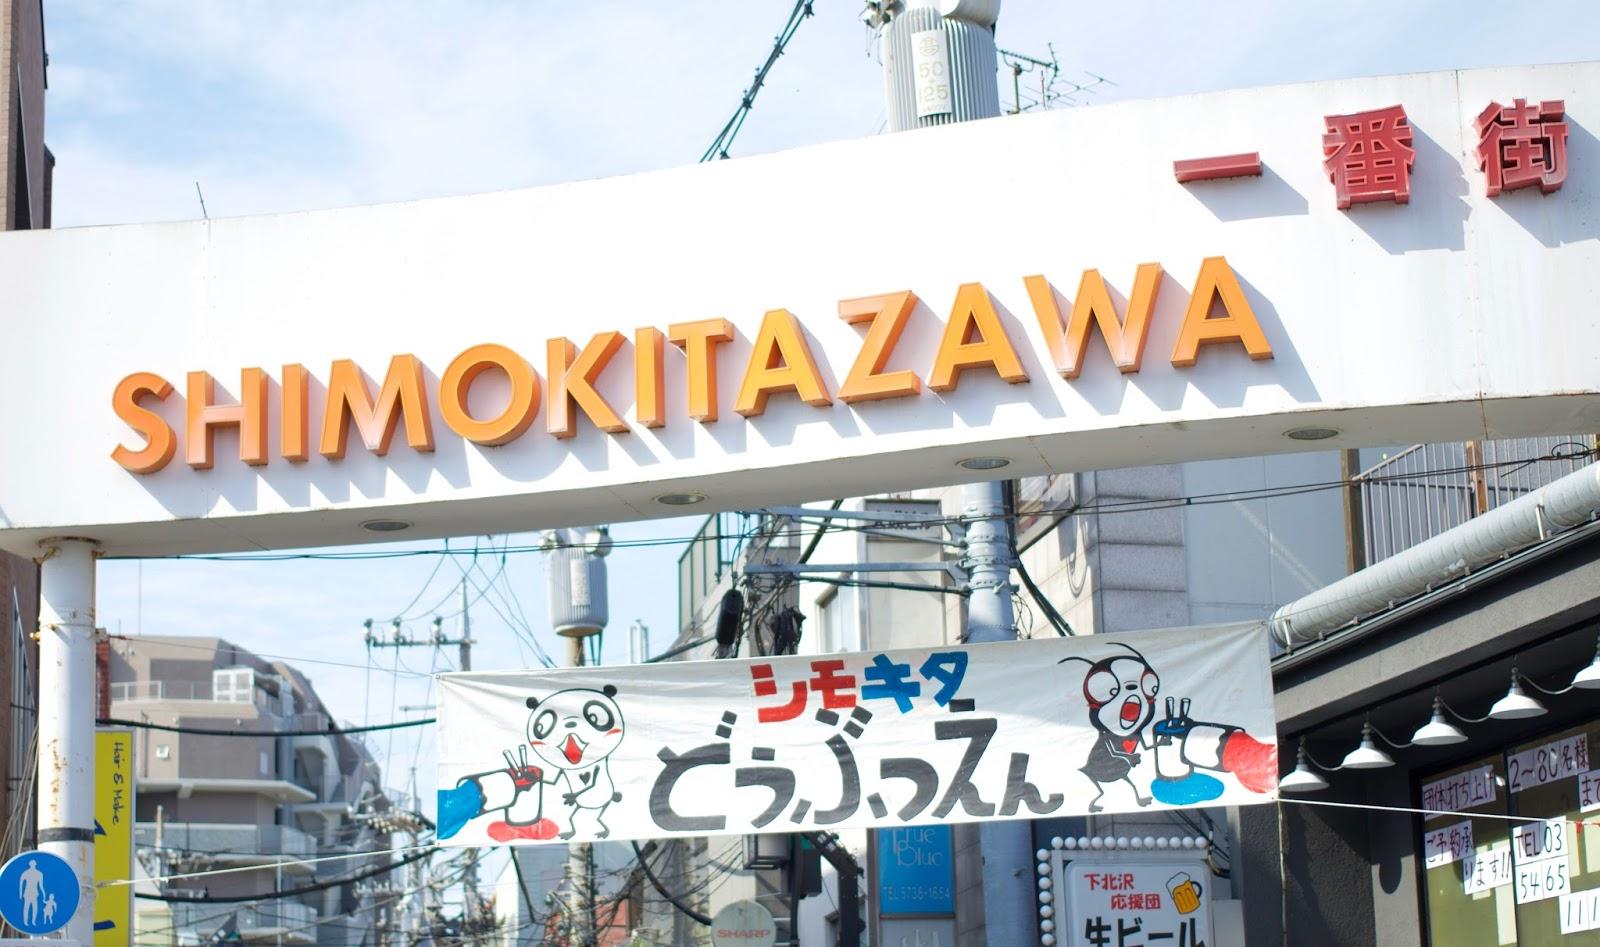 Shimokitazawa Tokyo Japan